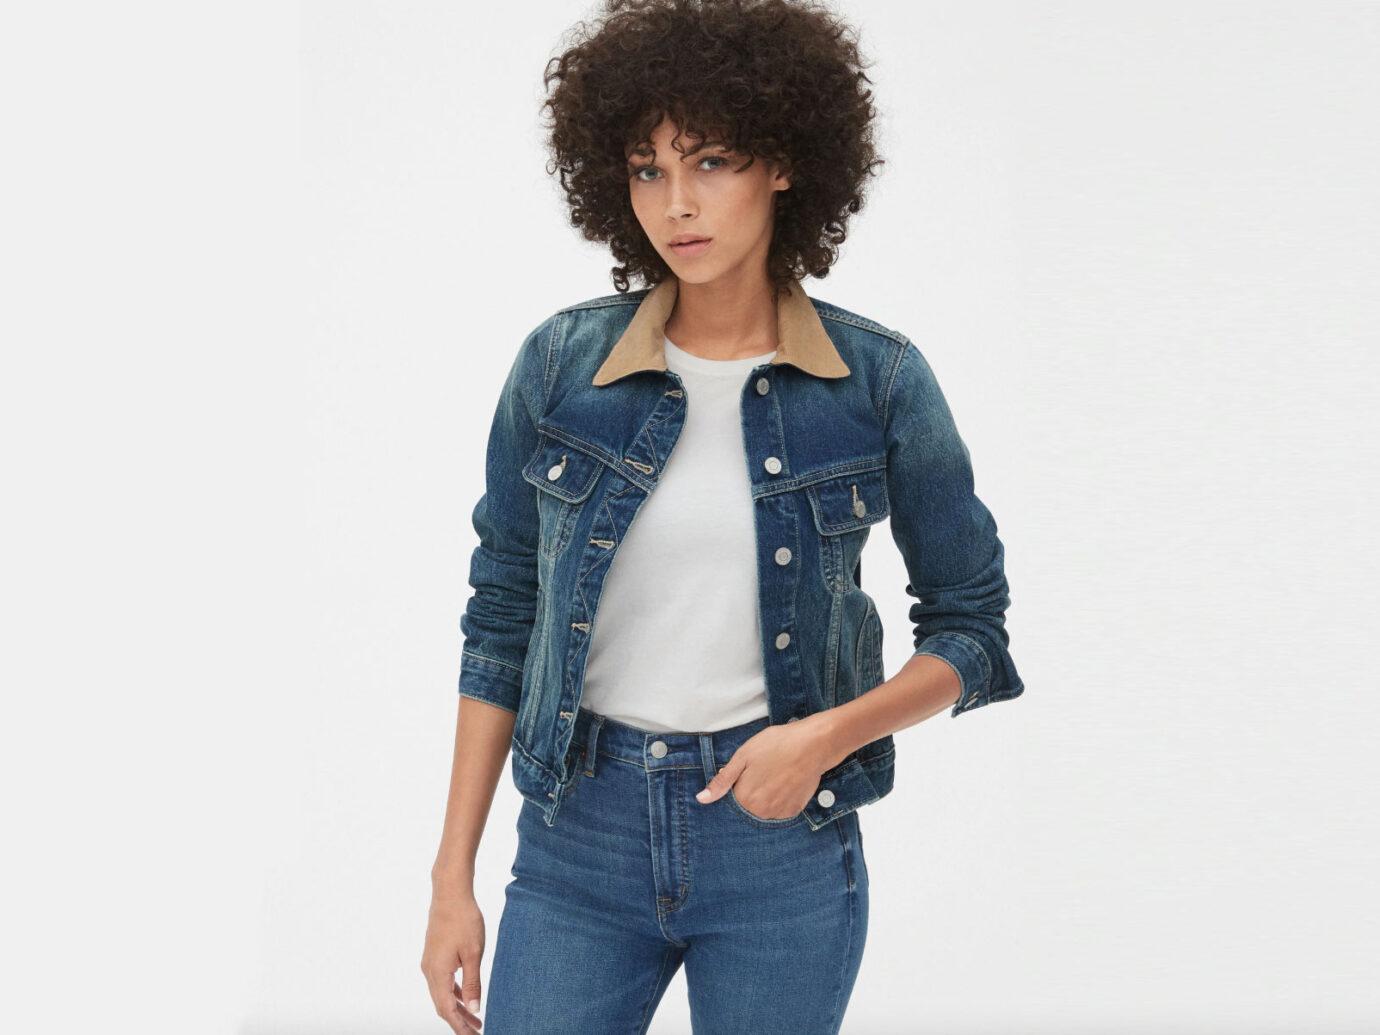 Gap 70s Pioneer Icon Denim Jacket